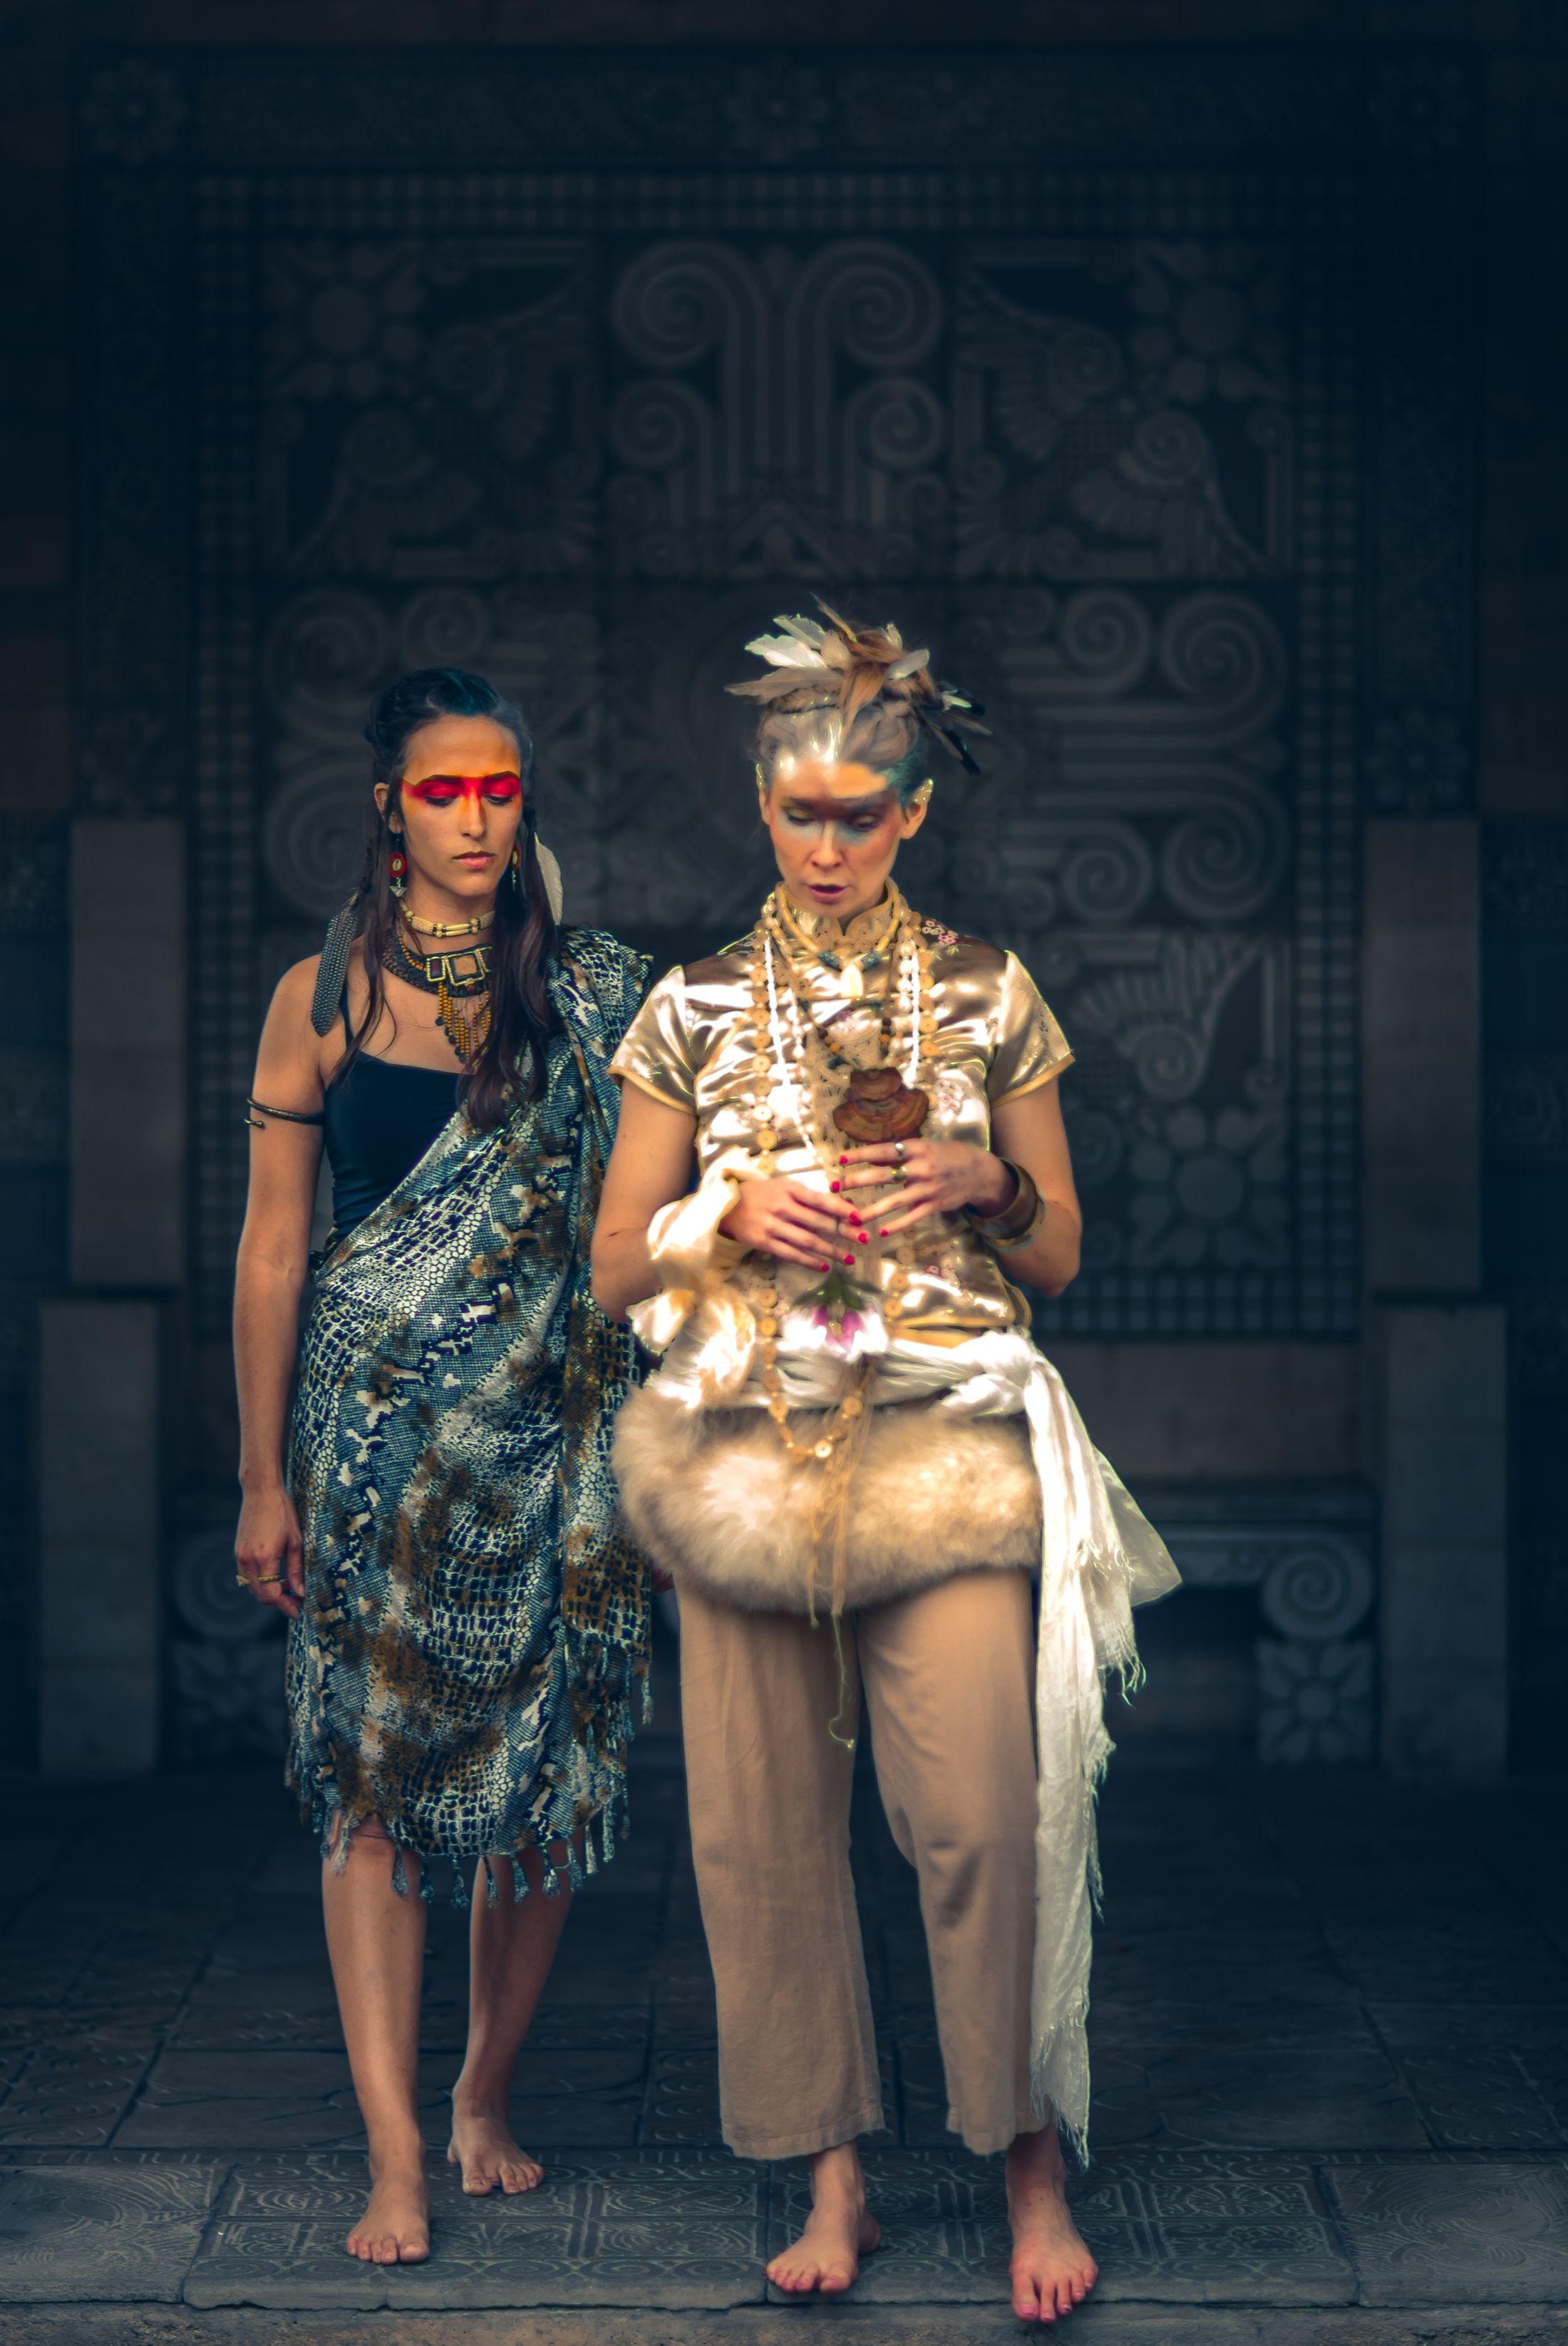 Electric Forest yoga LED light nomad festival style ethnic global fashion shoot warpaint tribal 16.jpg